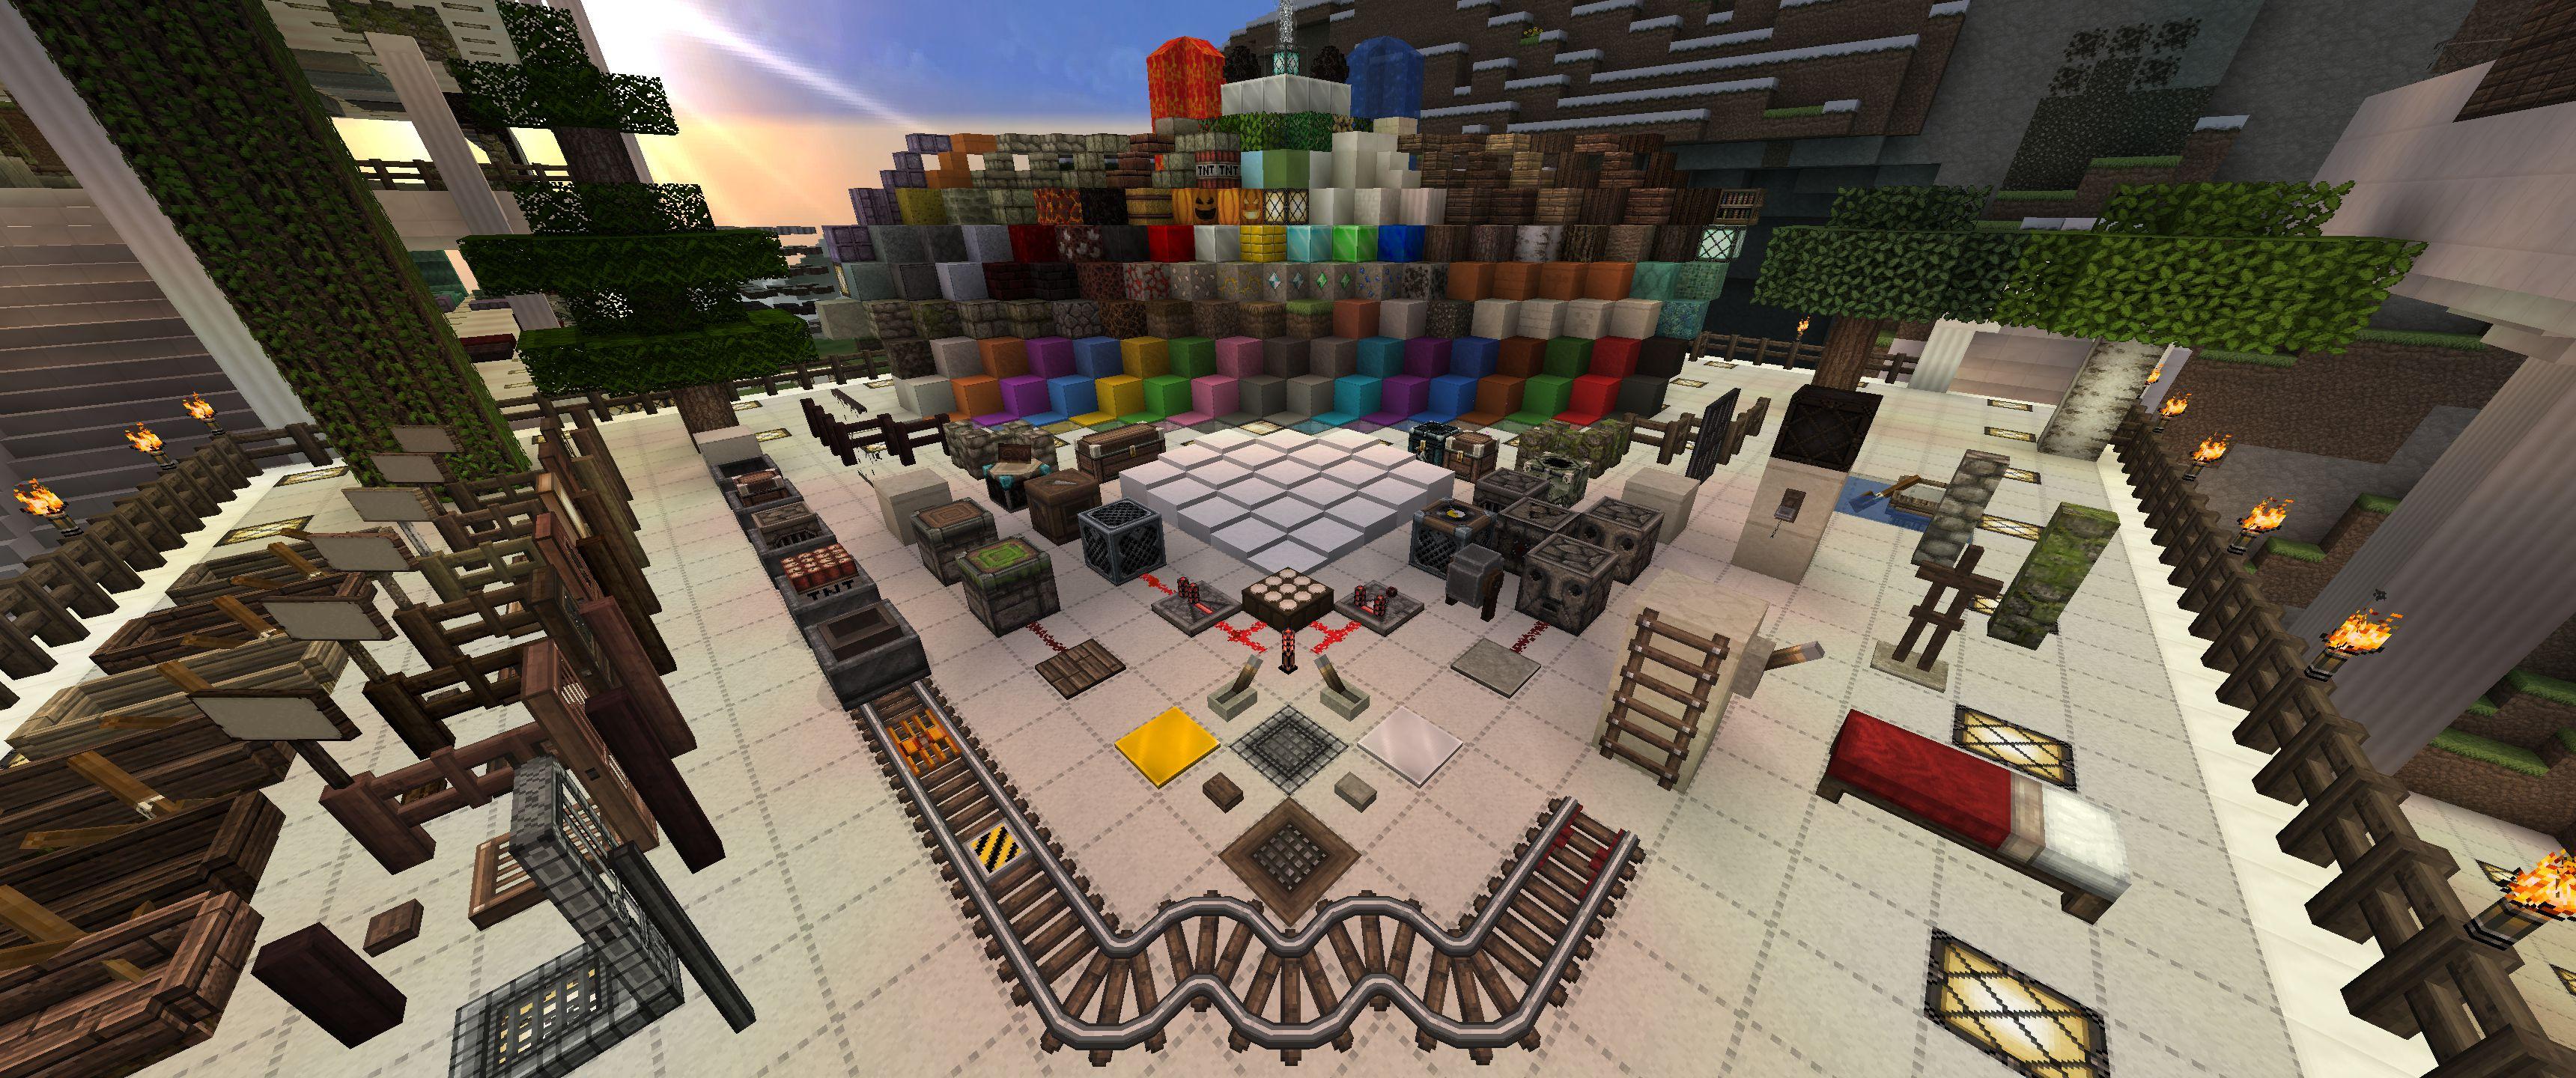 minecraft for pc full version uk